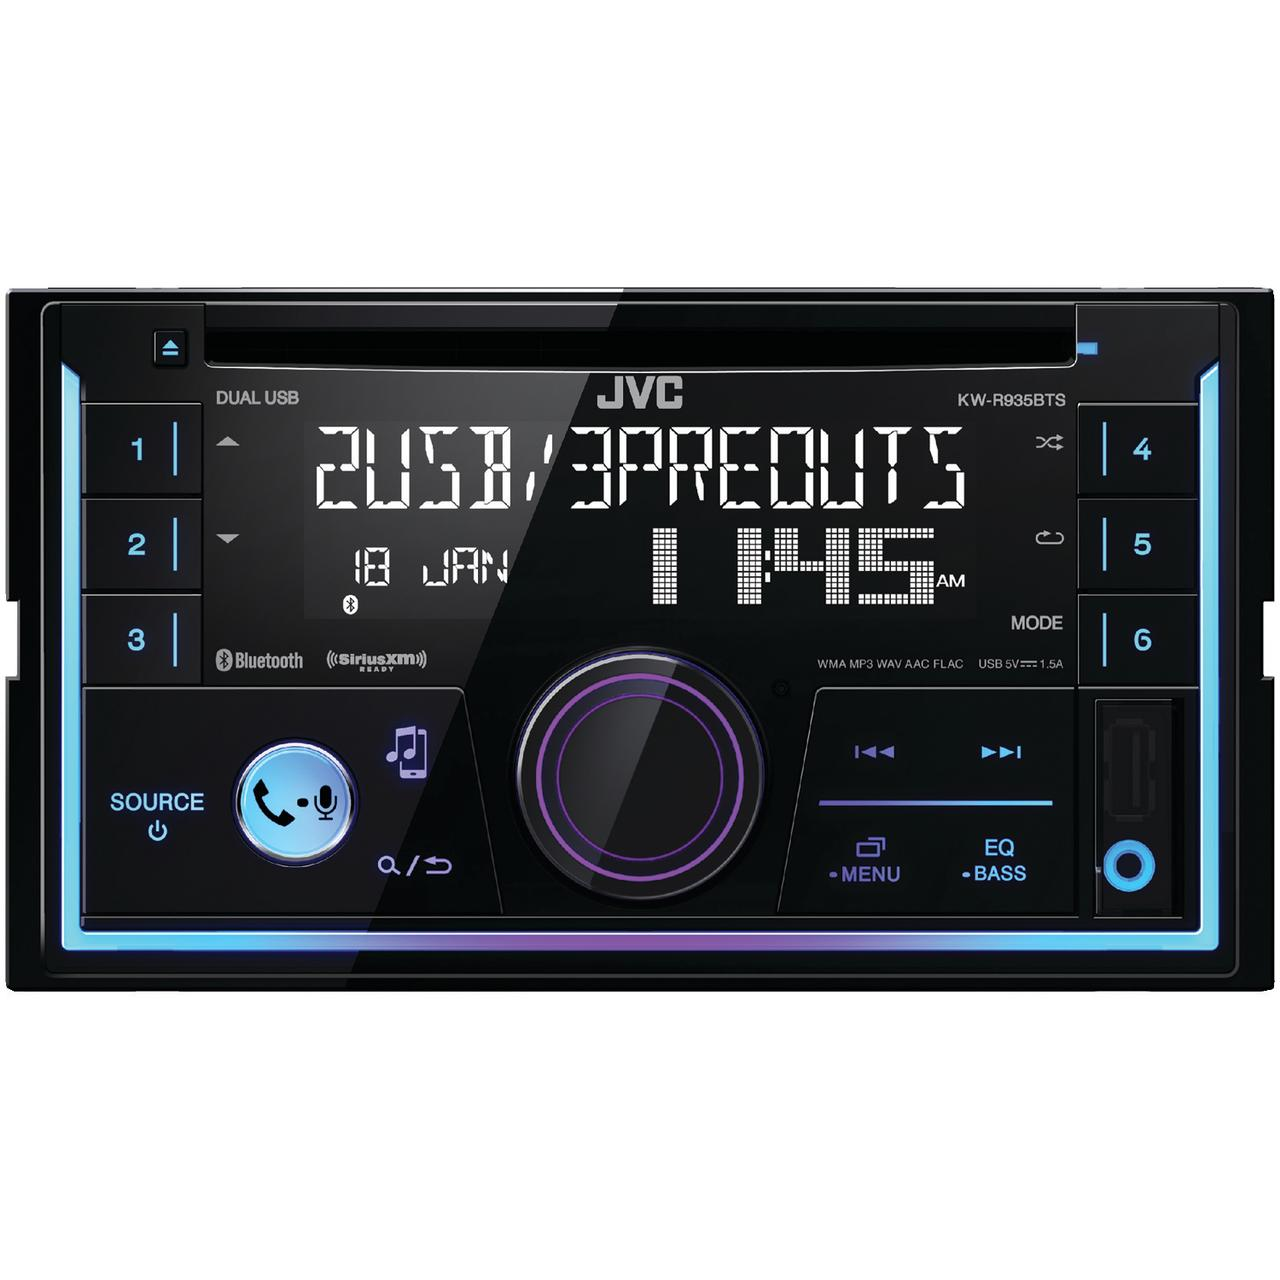 JVC Mobile KW-R935BTS KW-R935BTS Double-DIN In-Dash AM/FM CD Receiver with Bluetooth & SiriusXM Ready